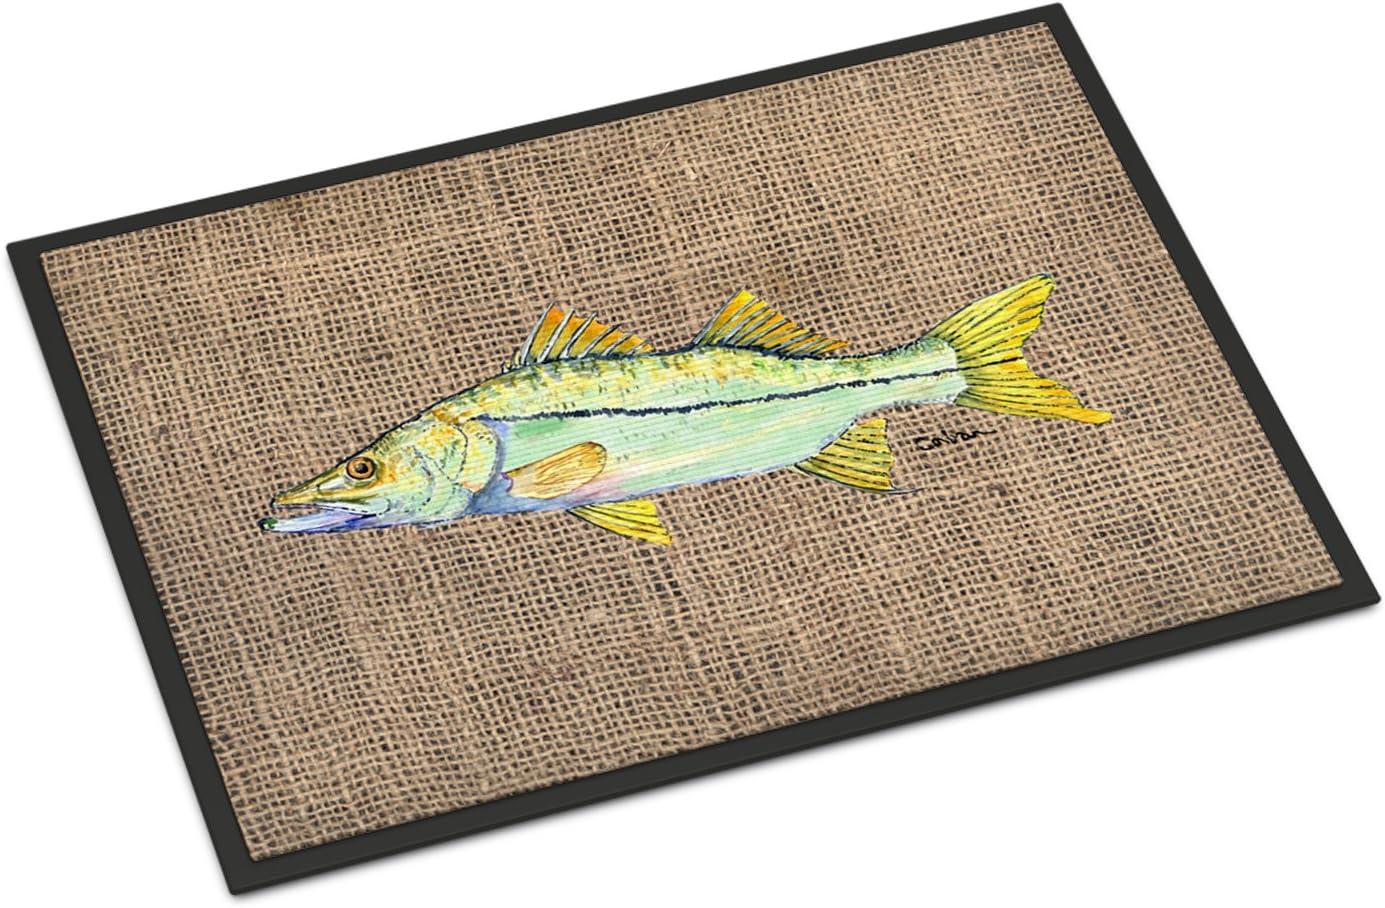 Caroline's Treasures 8772JMAT Fish Long Beach Mall - Snook Mat Outdoor or Indoor OFFicial site